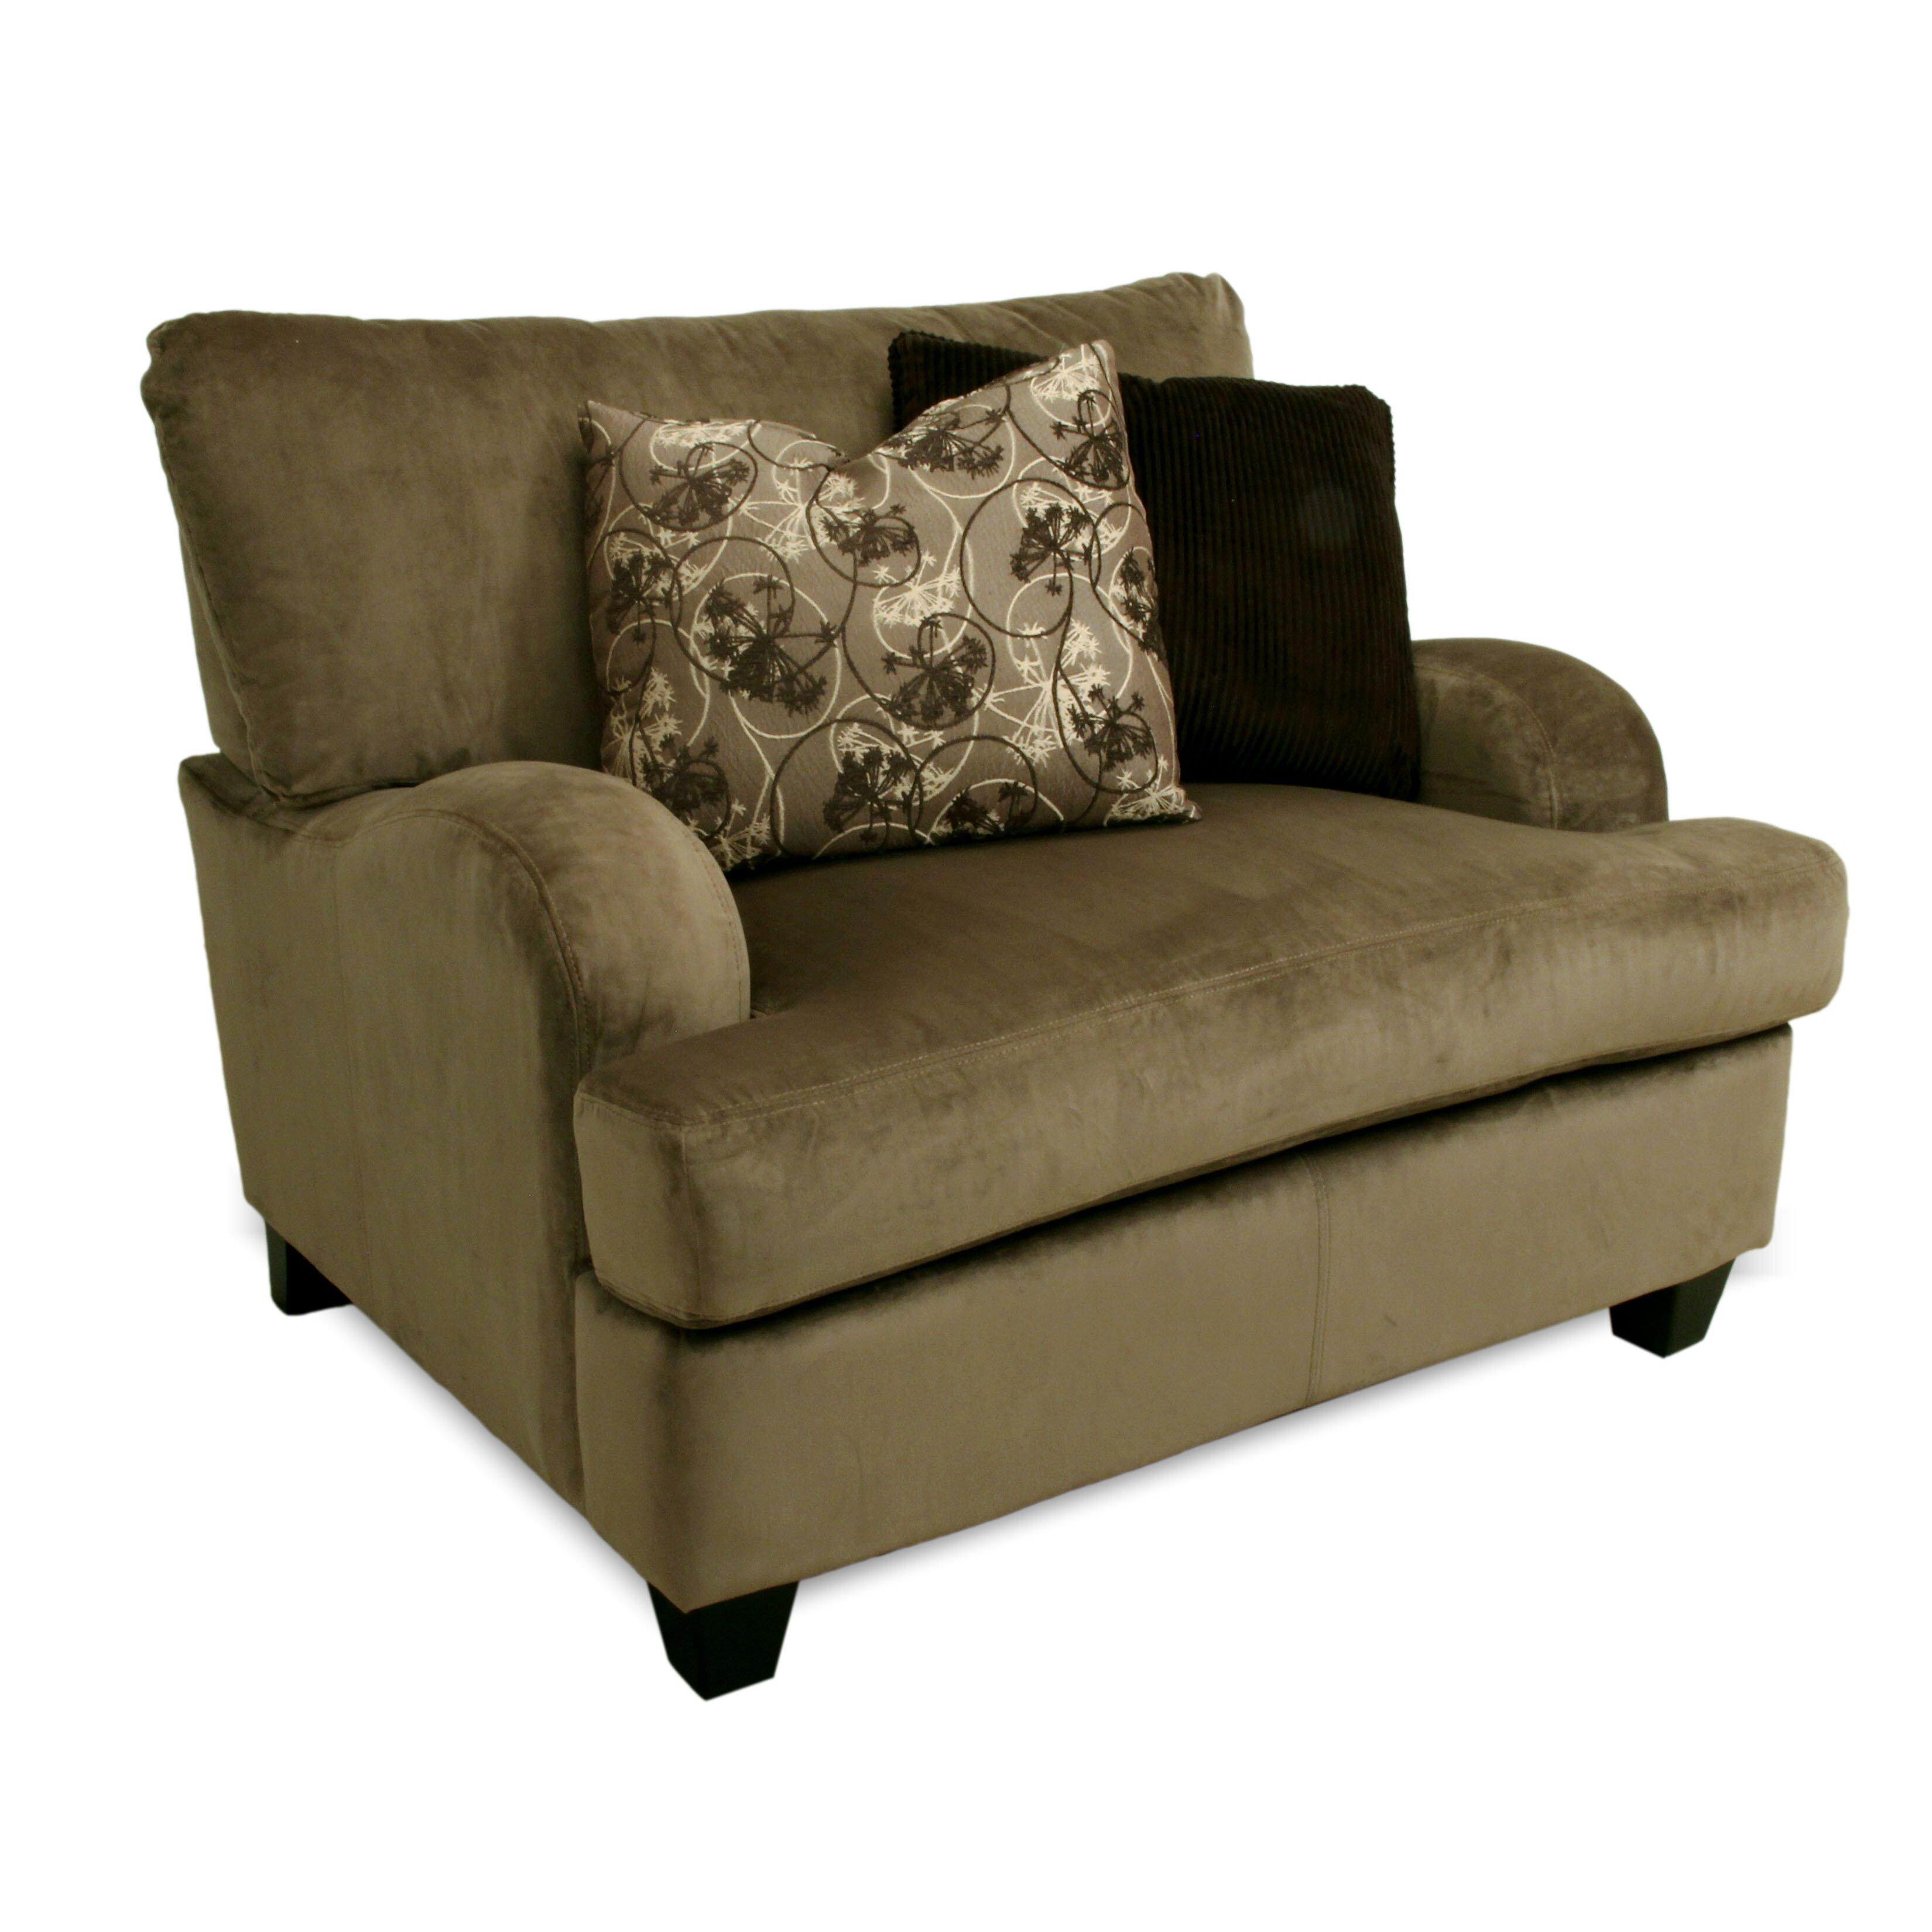 Soho futon roselawnlutheran for Soho sofa bed